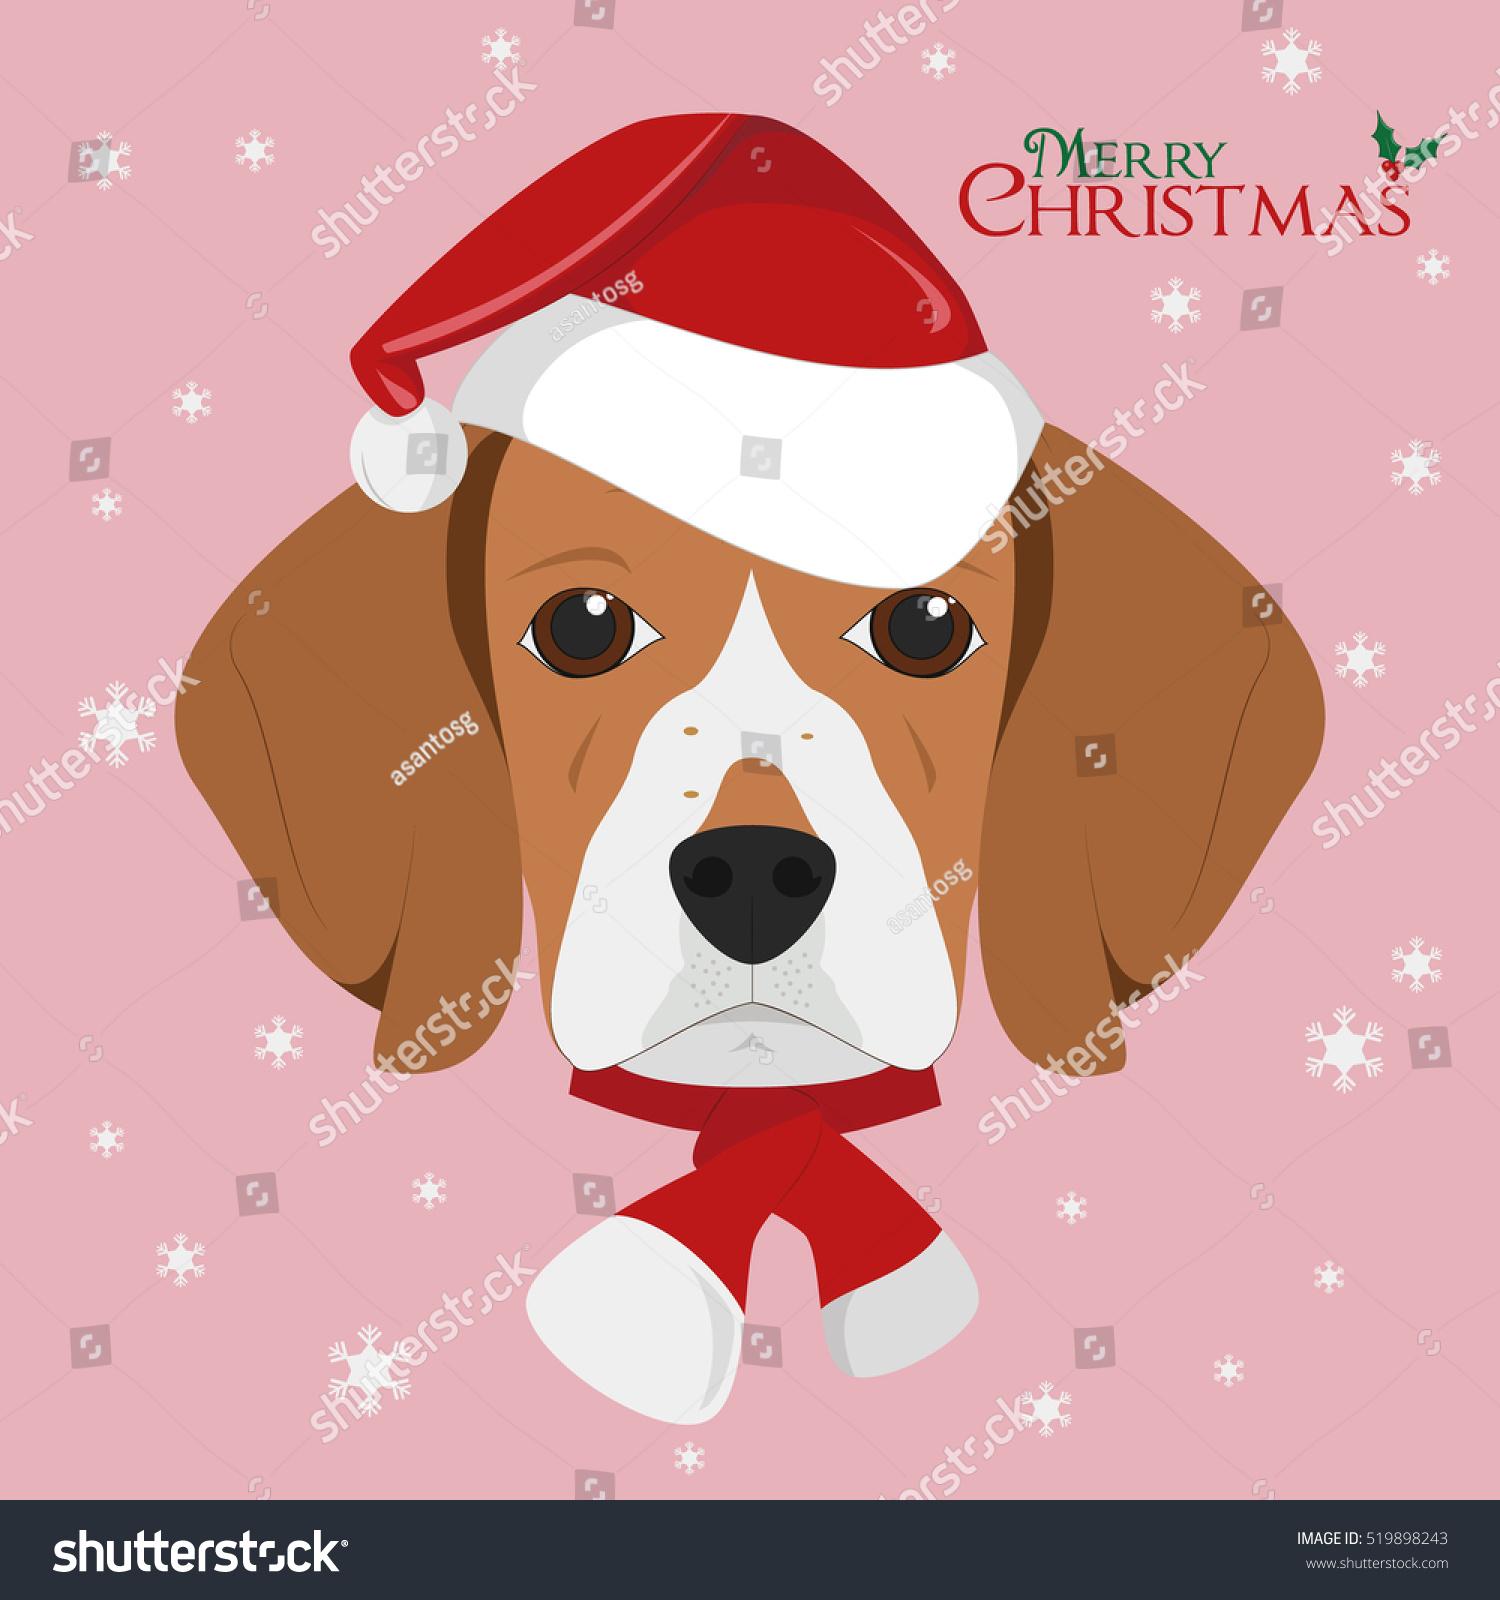 Christmas greeting card beagle dog red stock vector 519898243 christmas greeting card beagle dog with red santas hat kristyandbryce Image collections